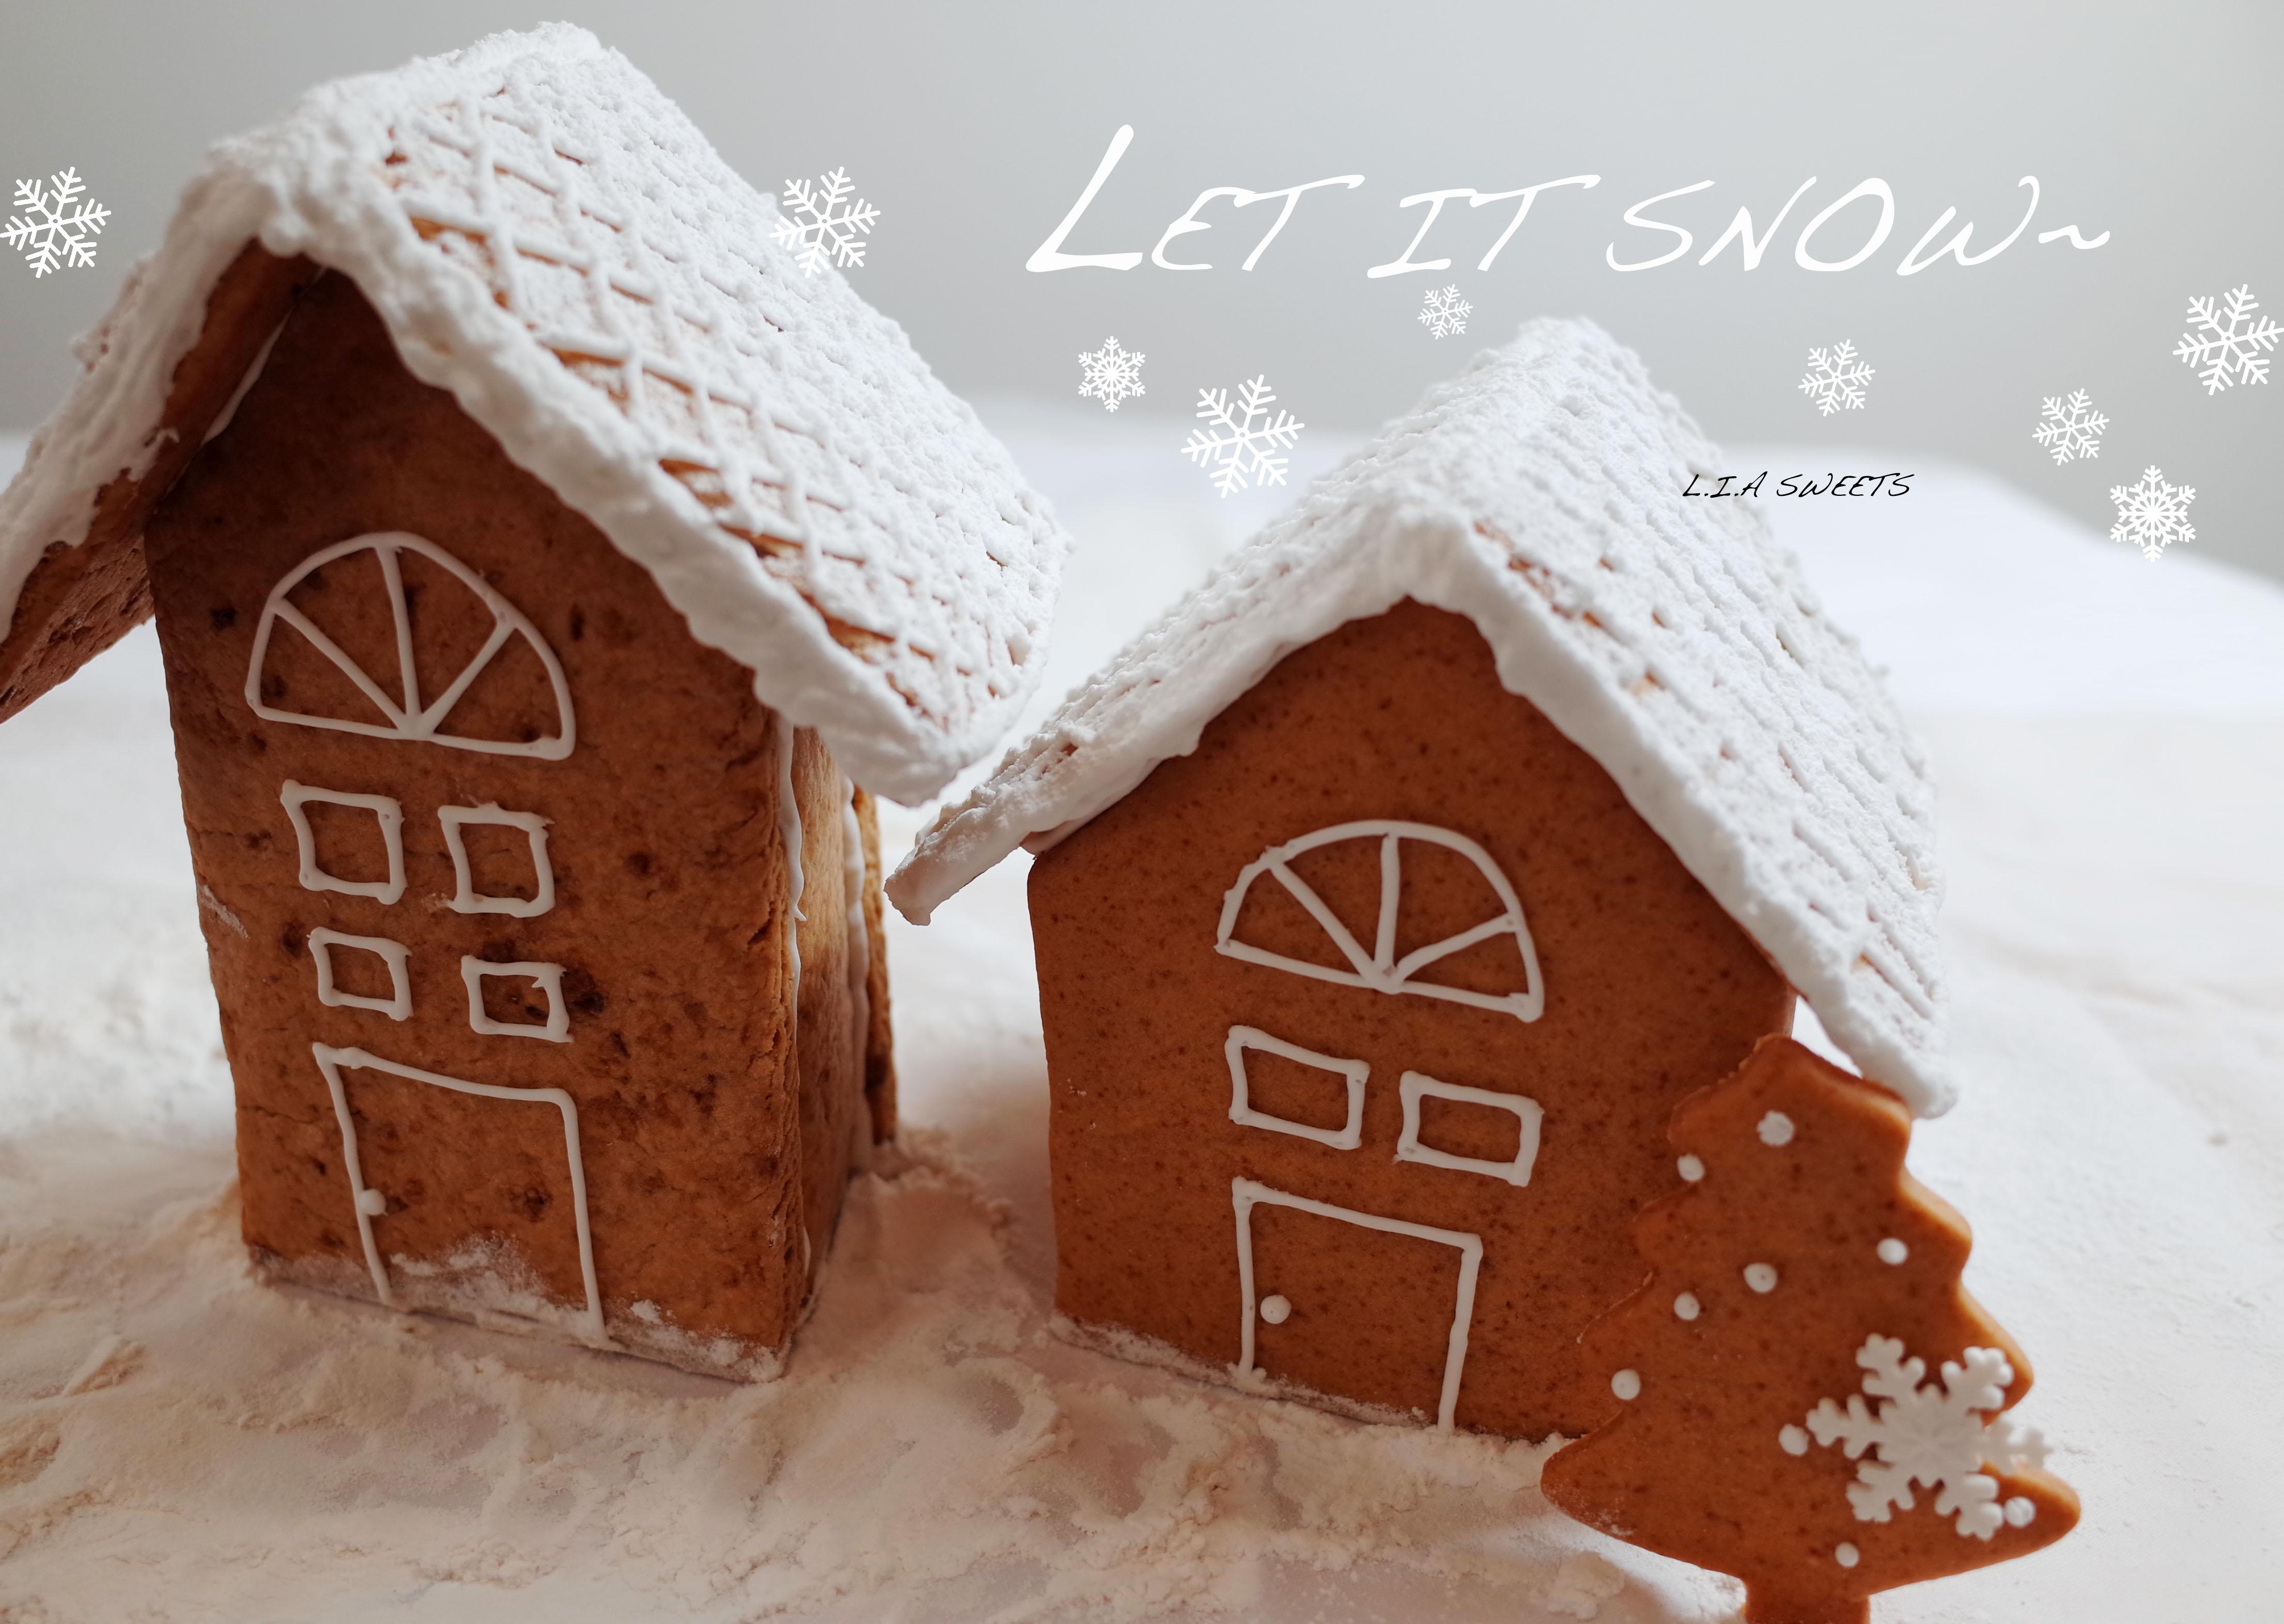 Merry Christmas薑餅屋